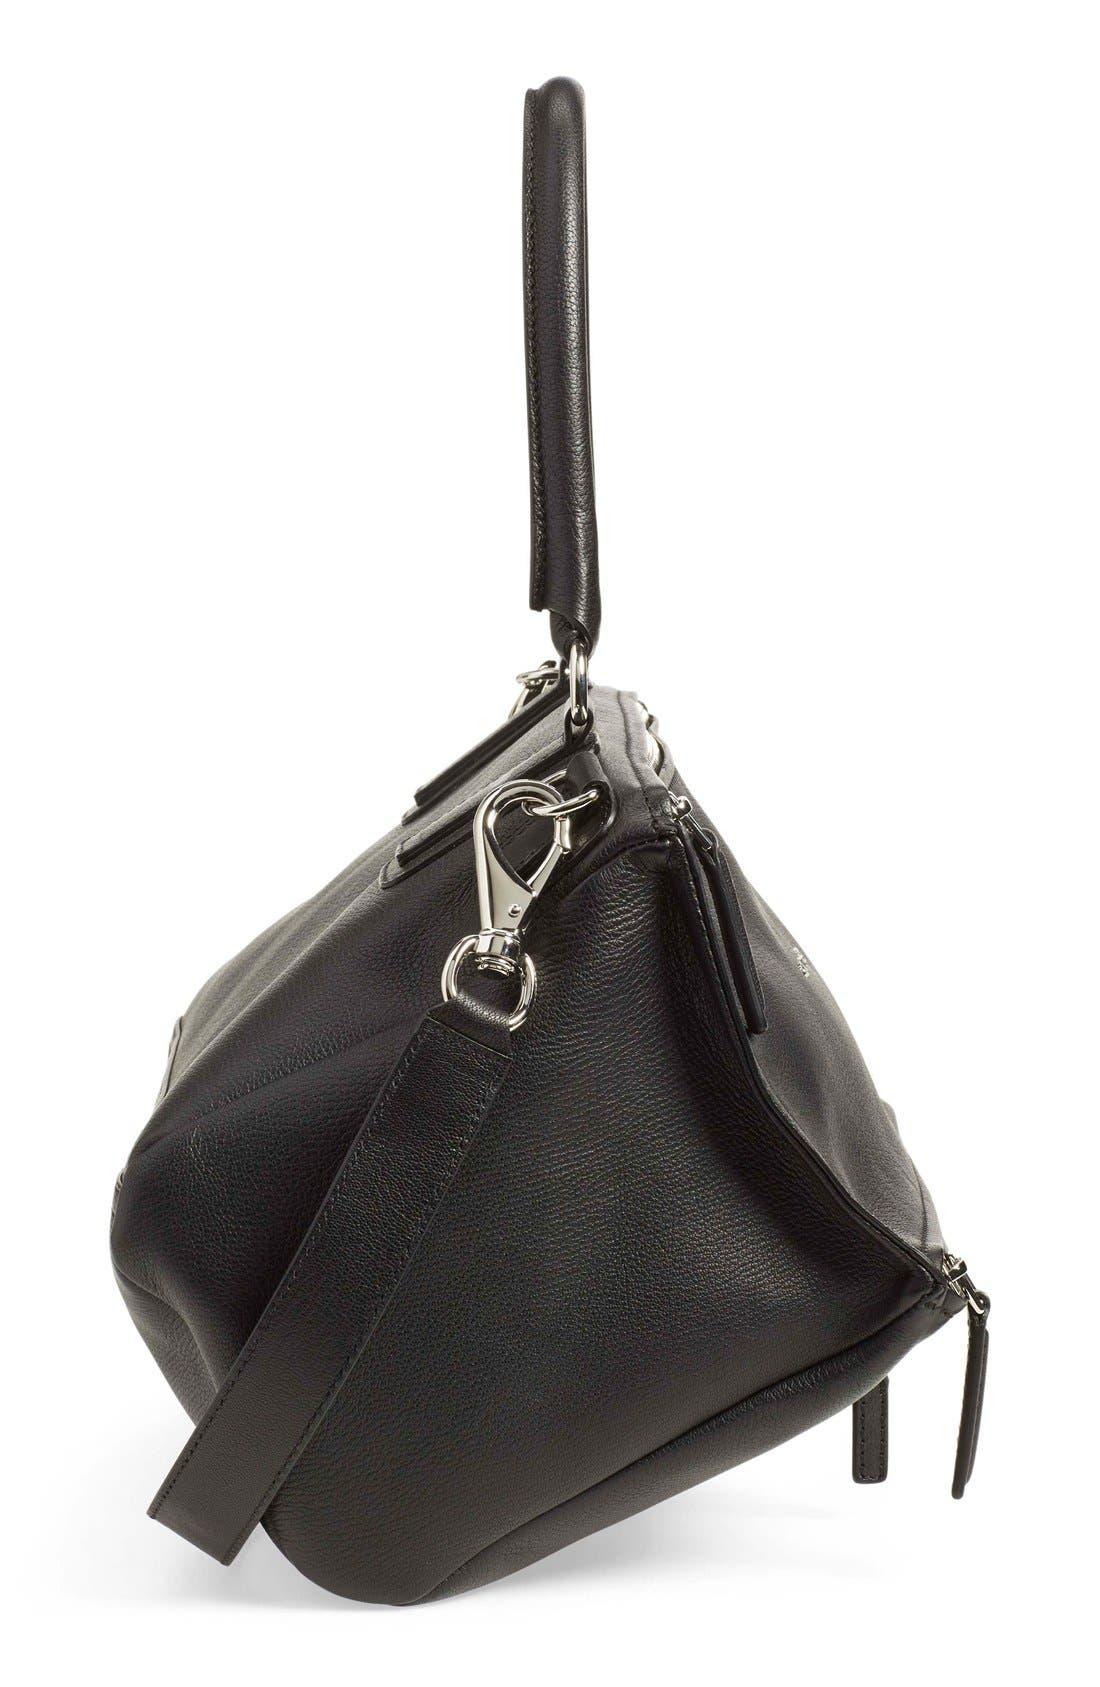 'Medium Pandora' Sugar Leather Satchel,                             Alternate thumbnail 5, color,                             Black